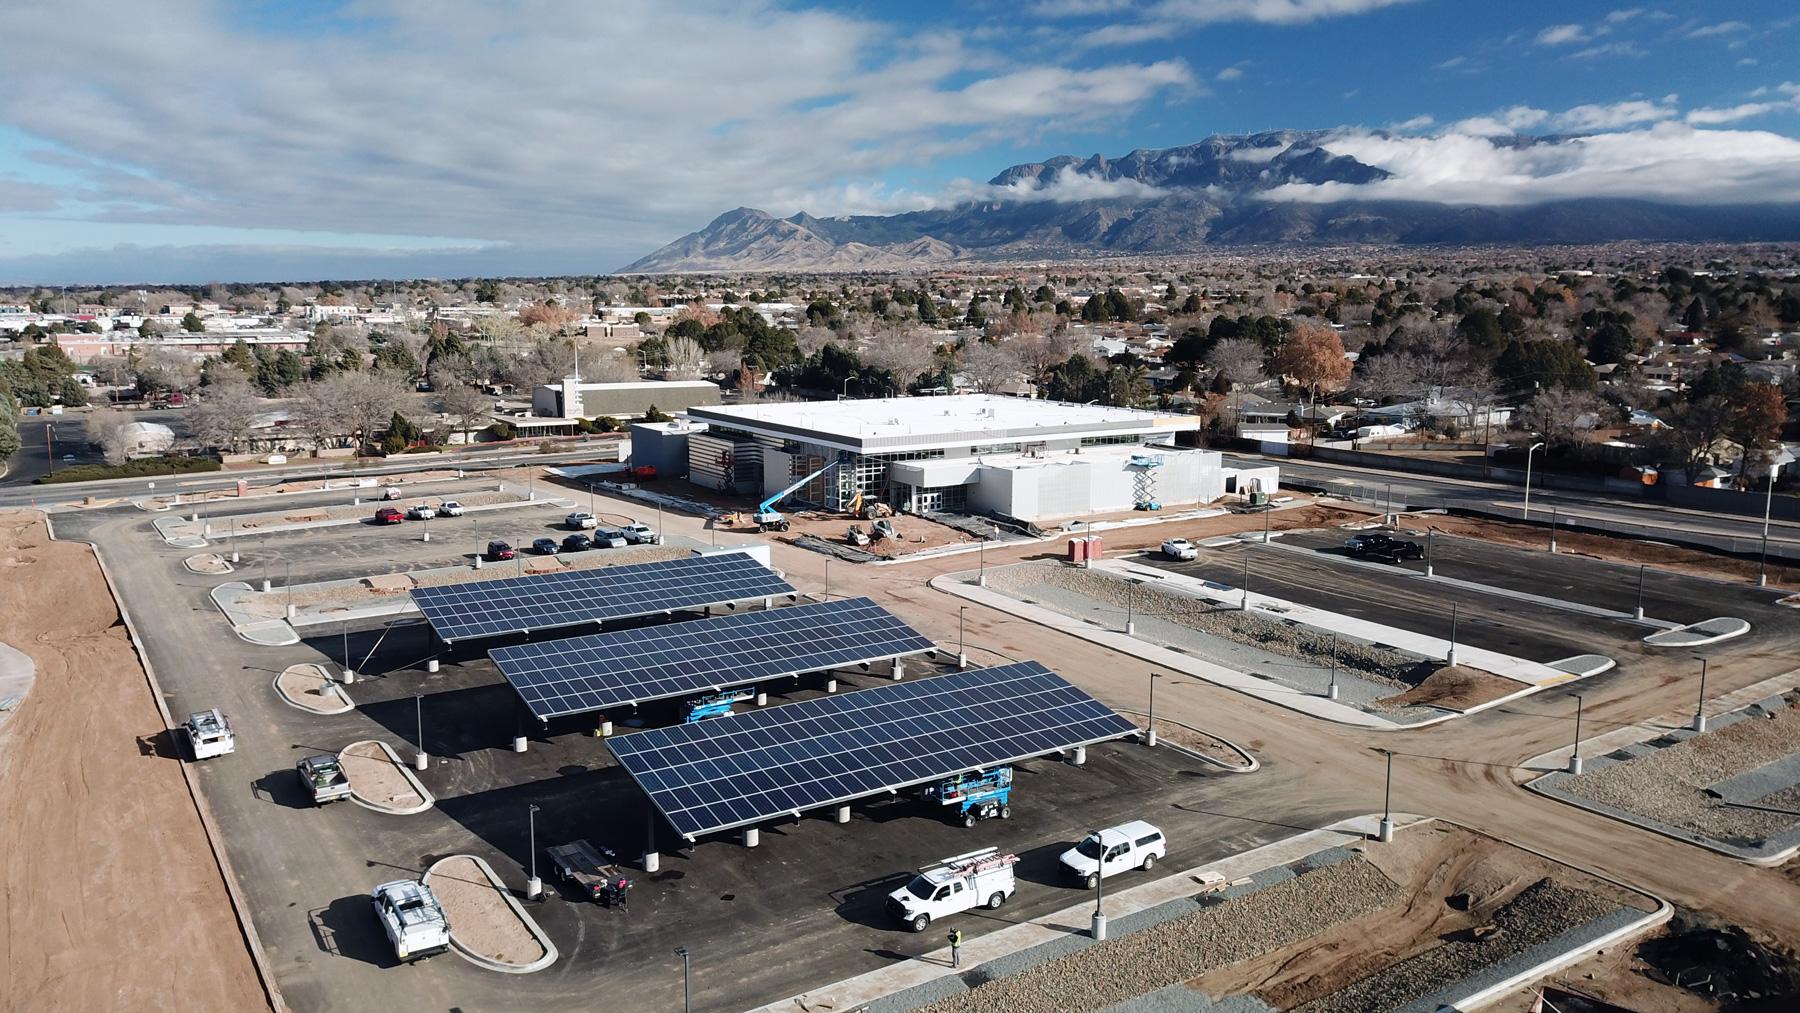 Albuquerque Public Schools Solar Installation, Sol Luna Solar